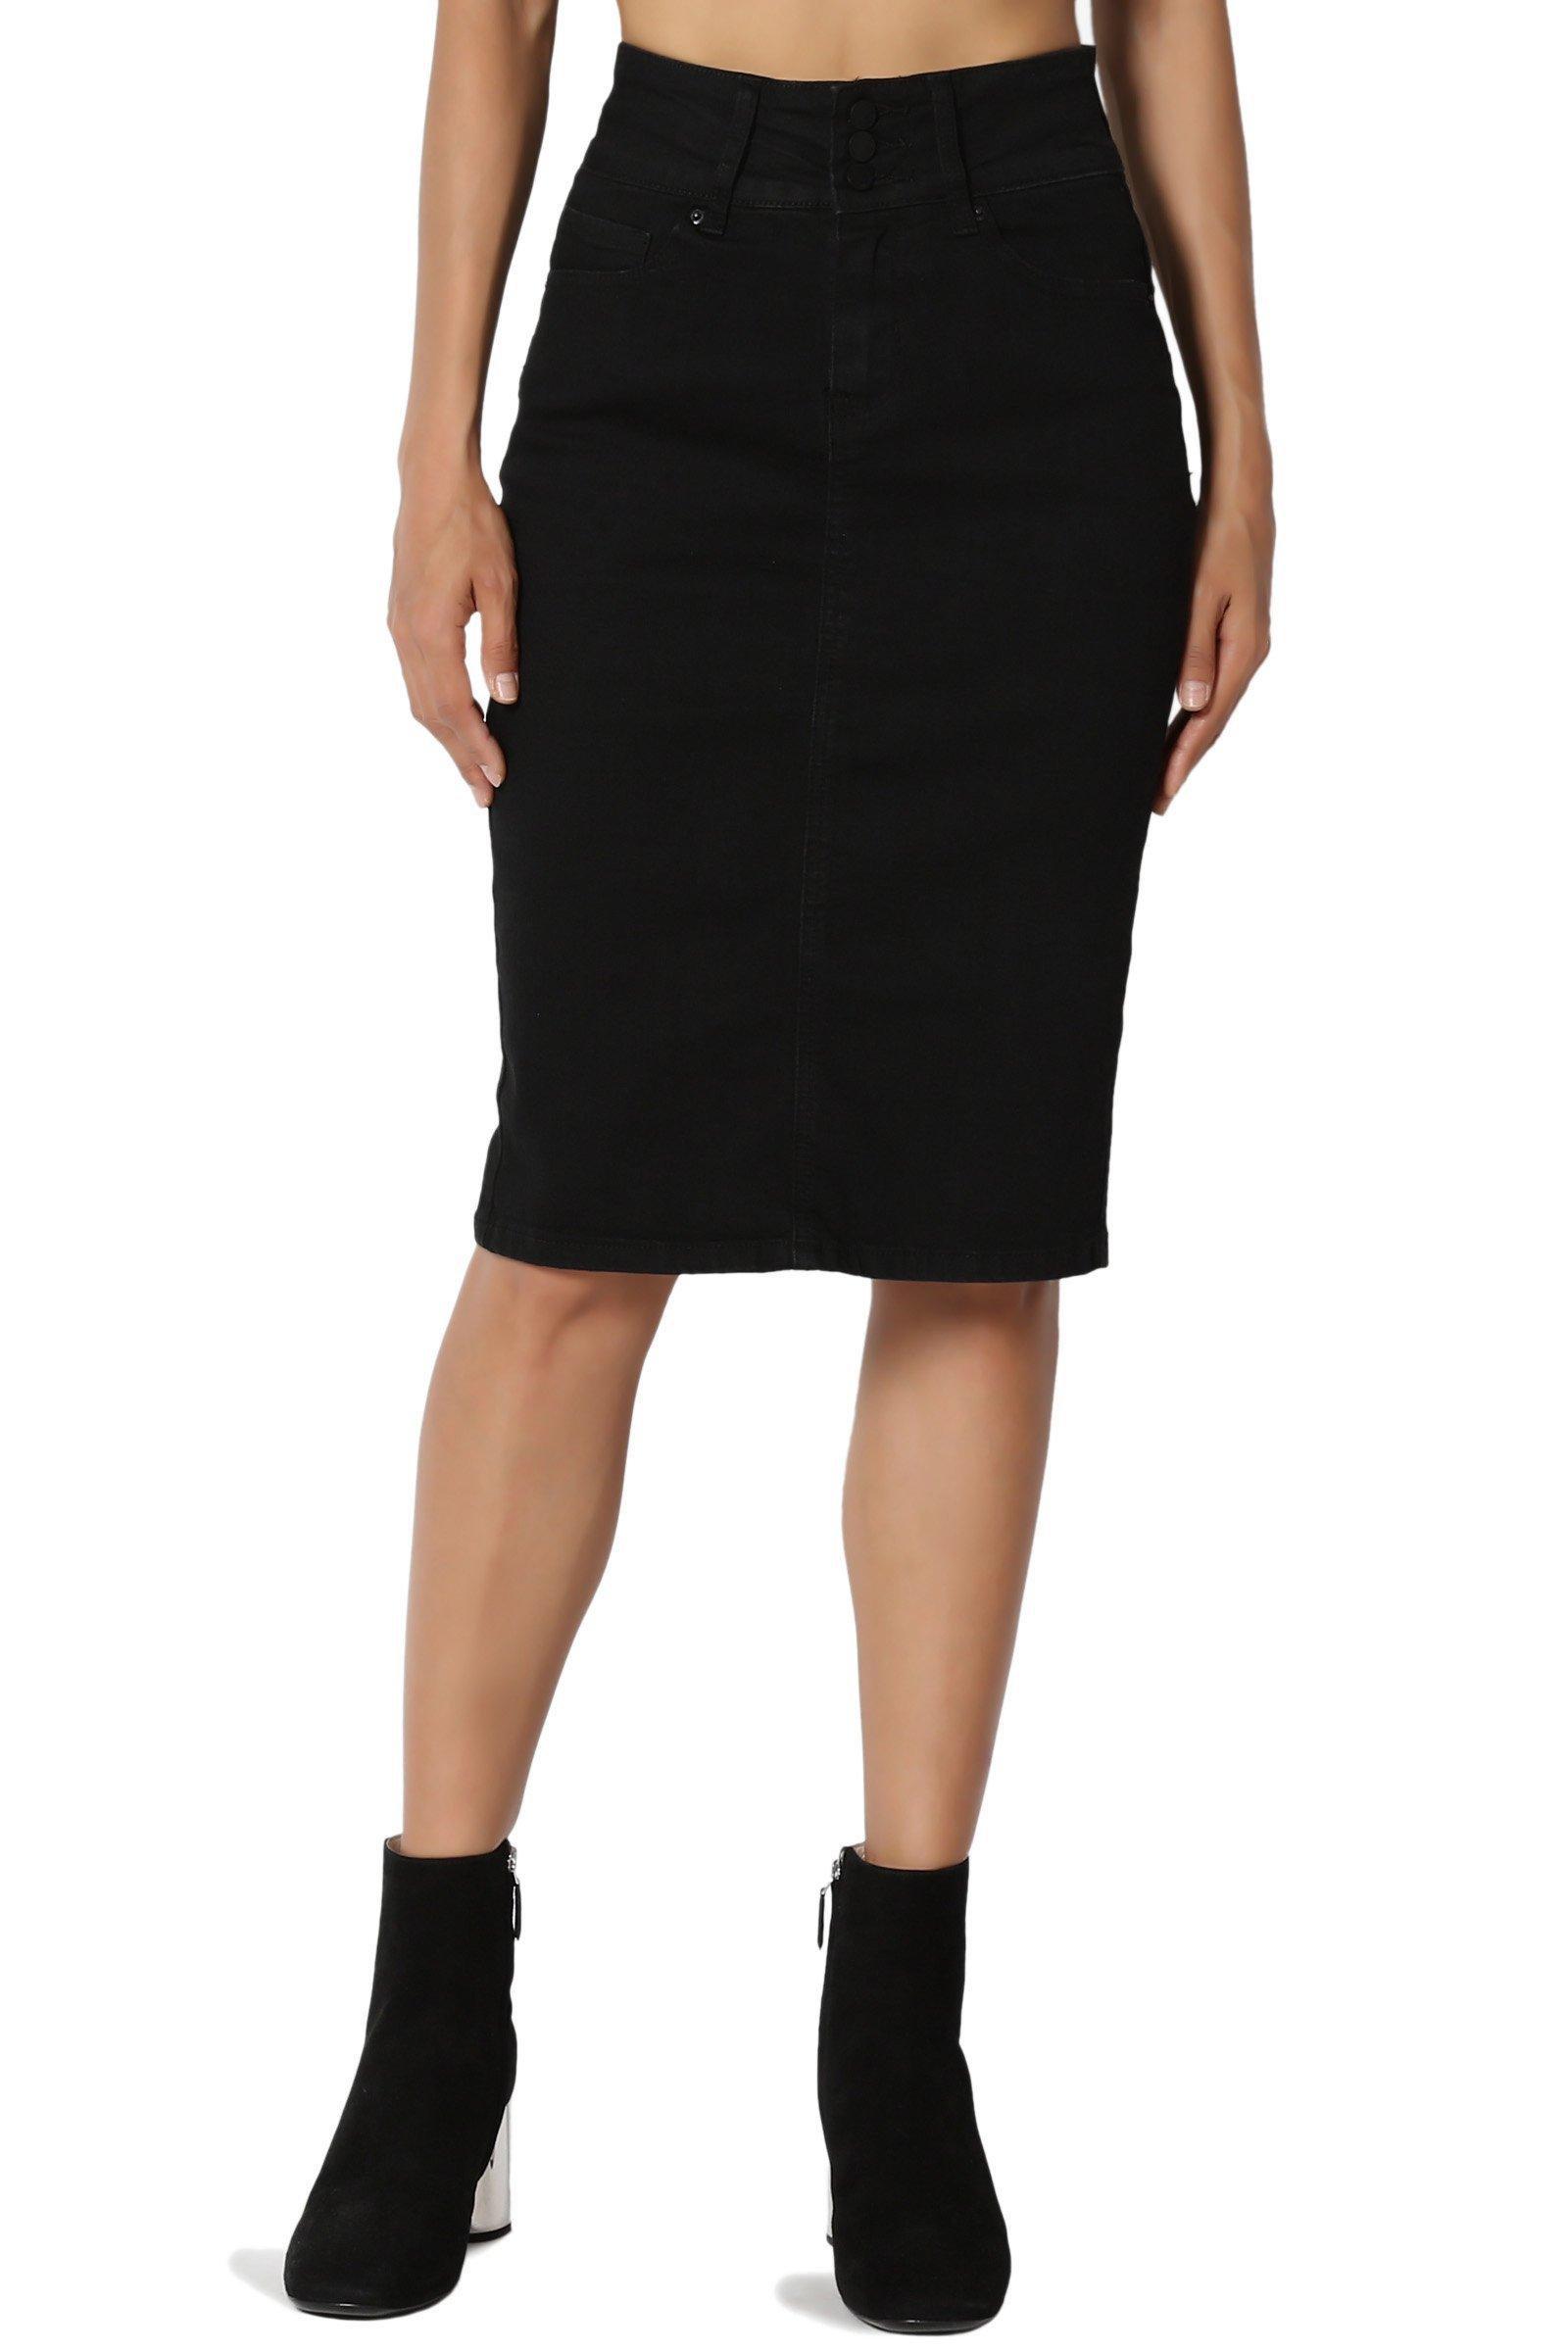 TheMogan Women's Butt Lift Indigo Pencil Knee Midi Stretch Denim Skirt Black L